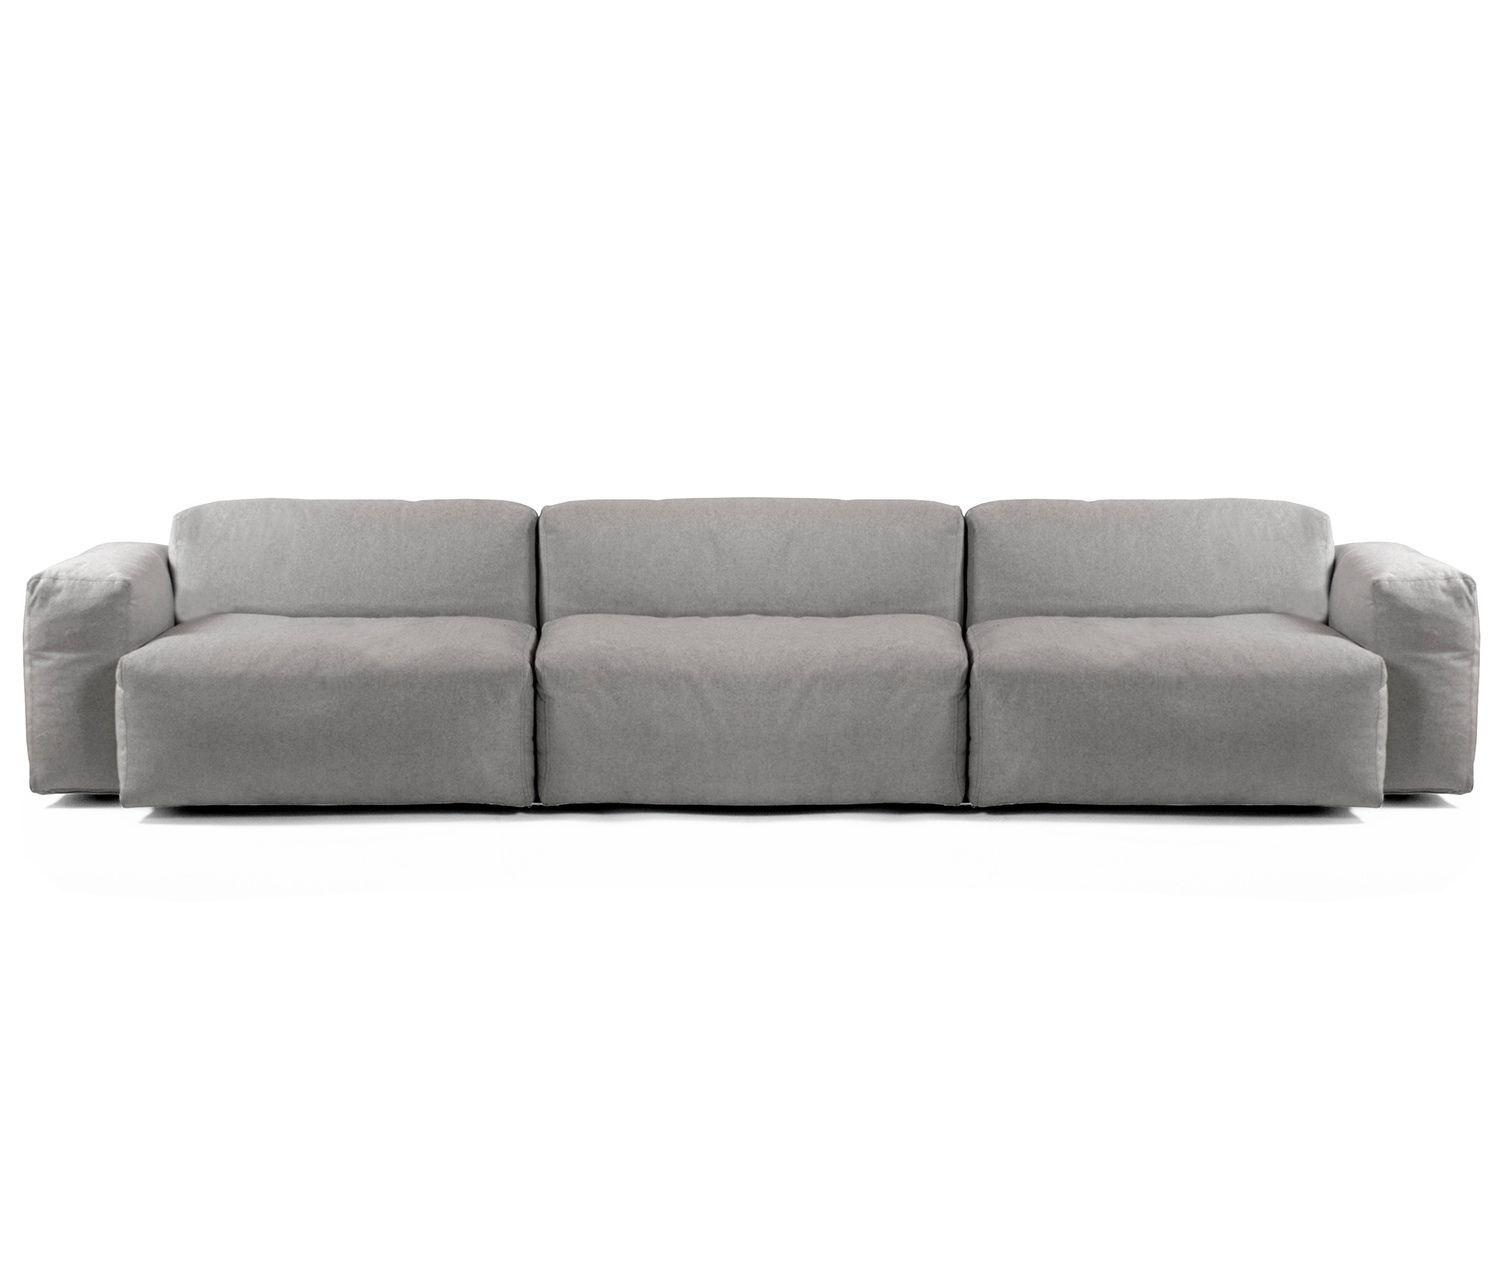 Sofa Pillows Cappellini Superoblong Modular Sofa by Jasper Morrison Modern Couch Cassina DWR eBay